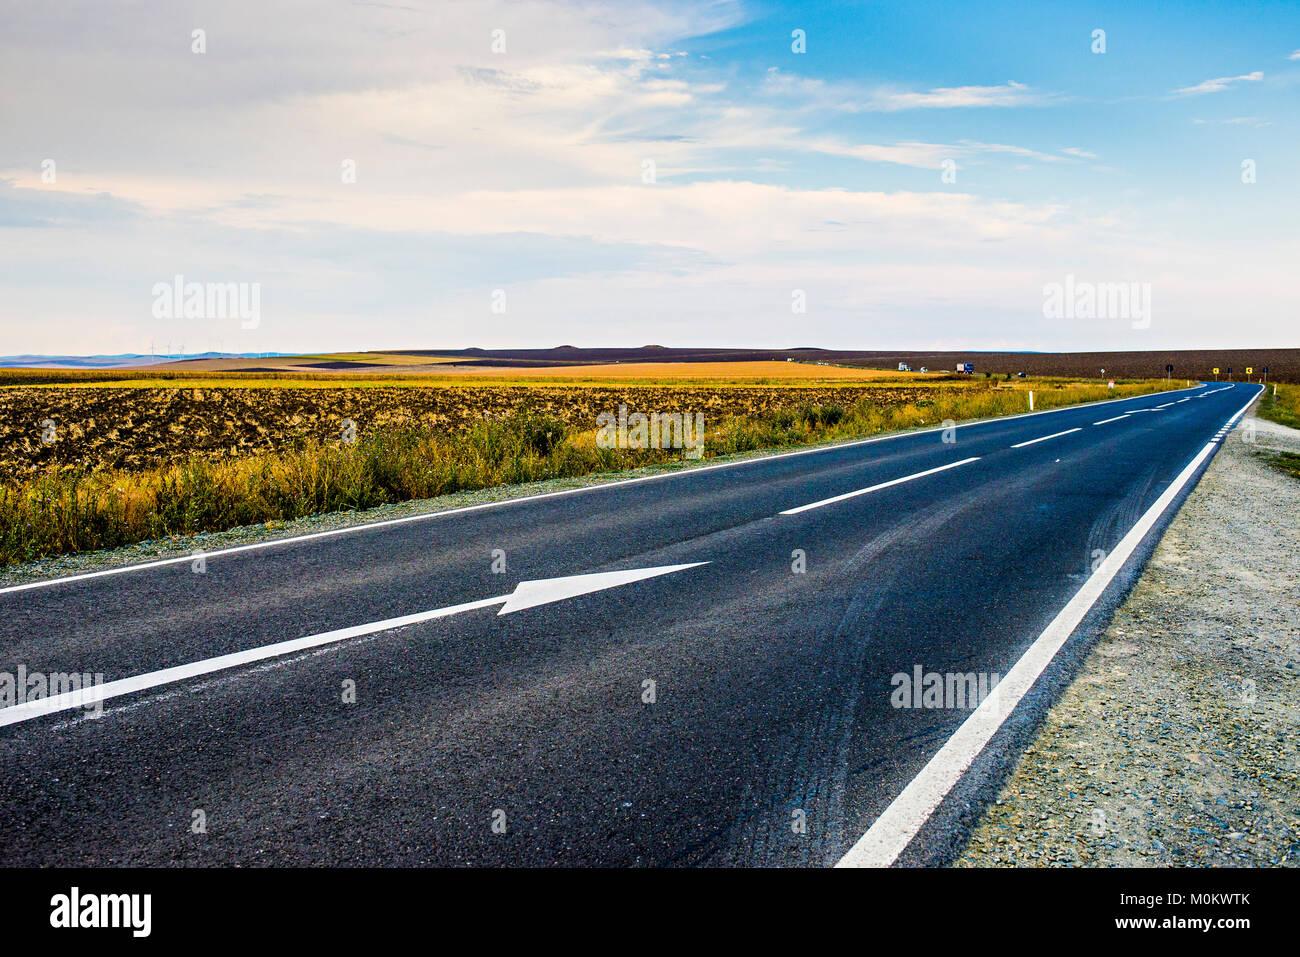 Asphalt road going through Romania country - Stock Image